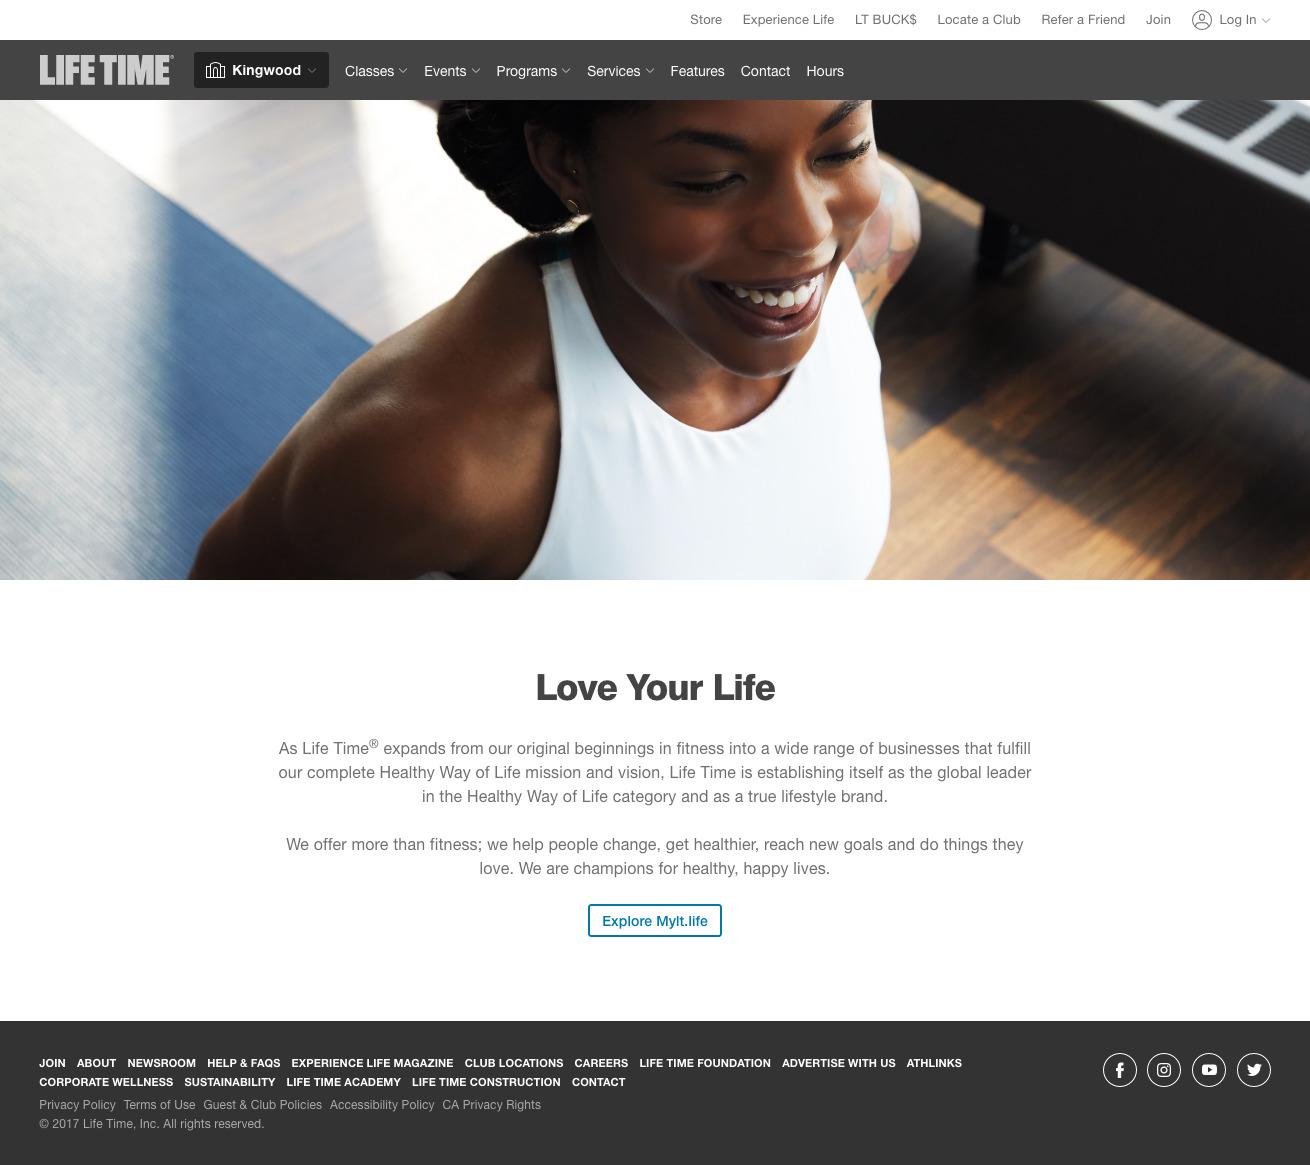 New Web Address  Mylt.life  Life Time.jpg